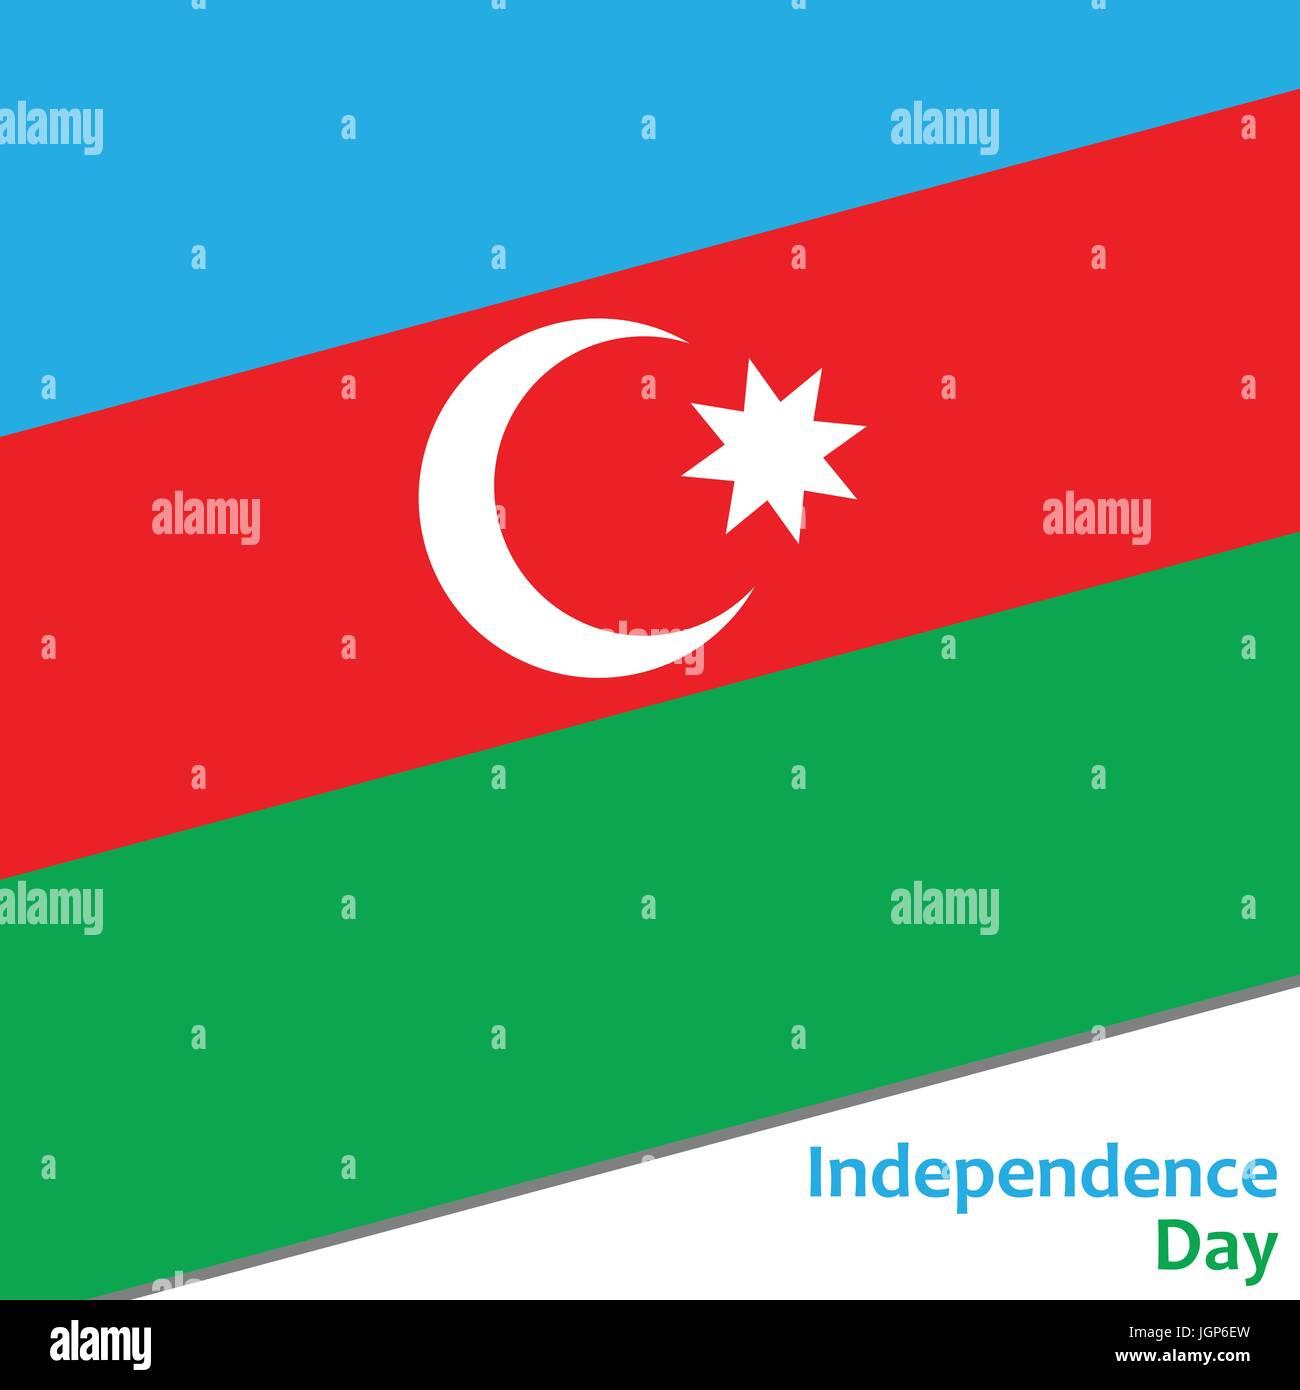 Azerbaijan independence day - Stock Vector